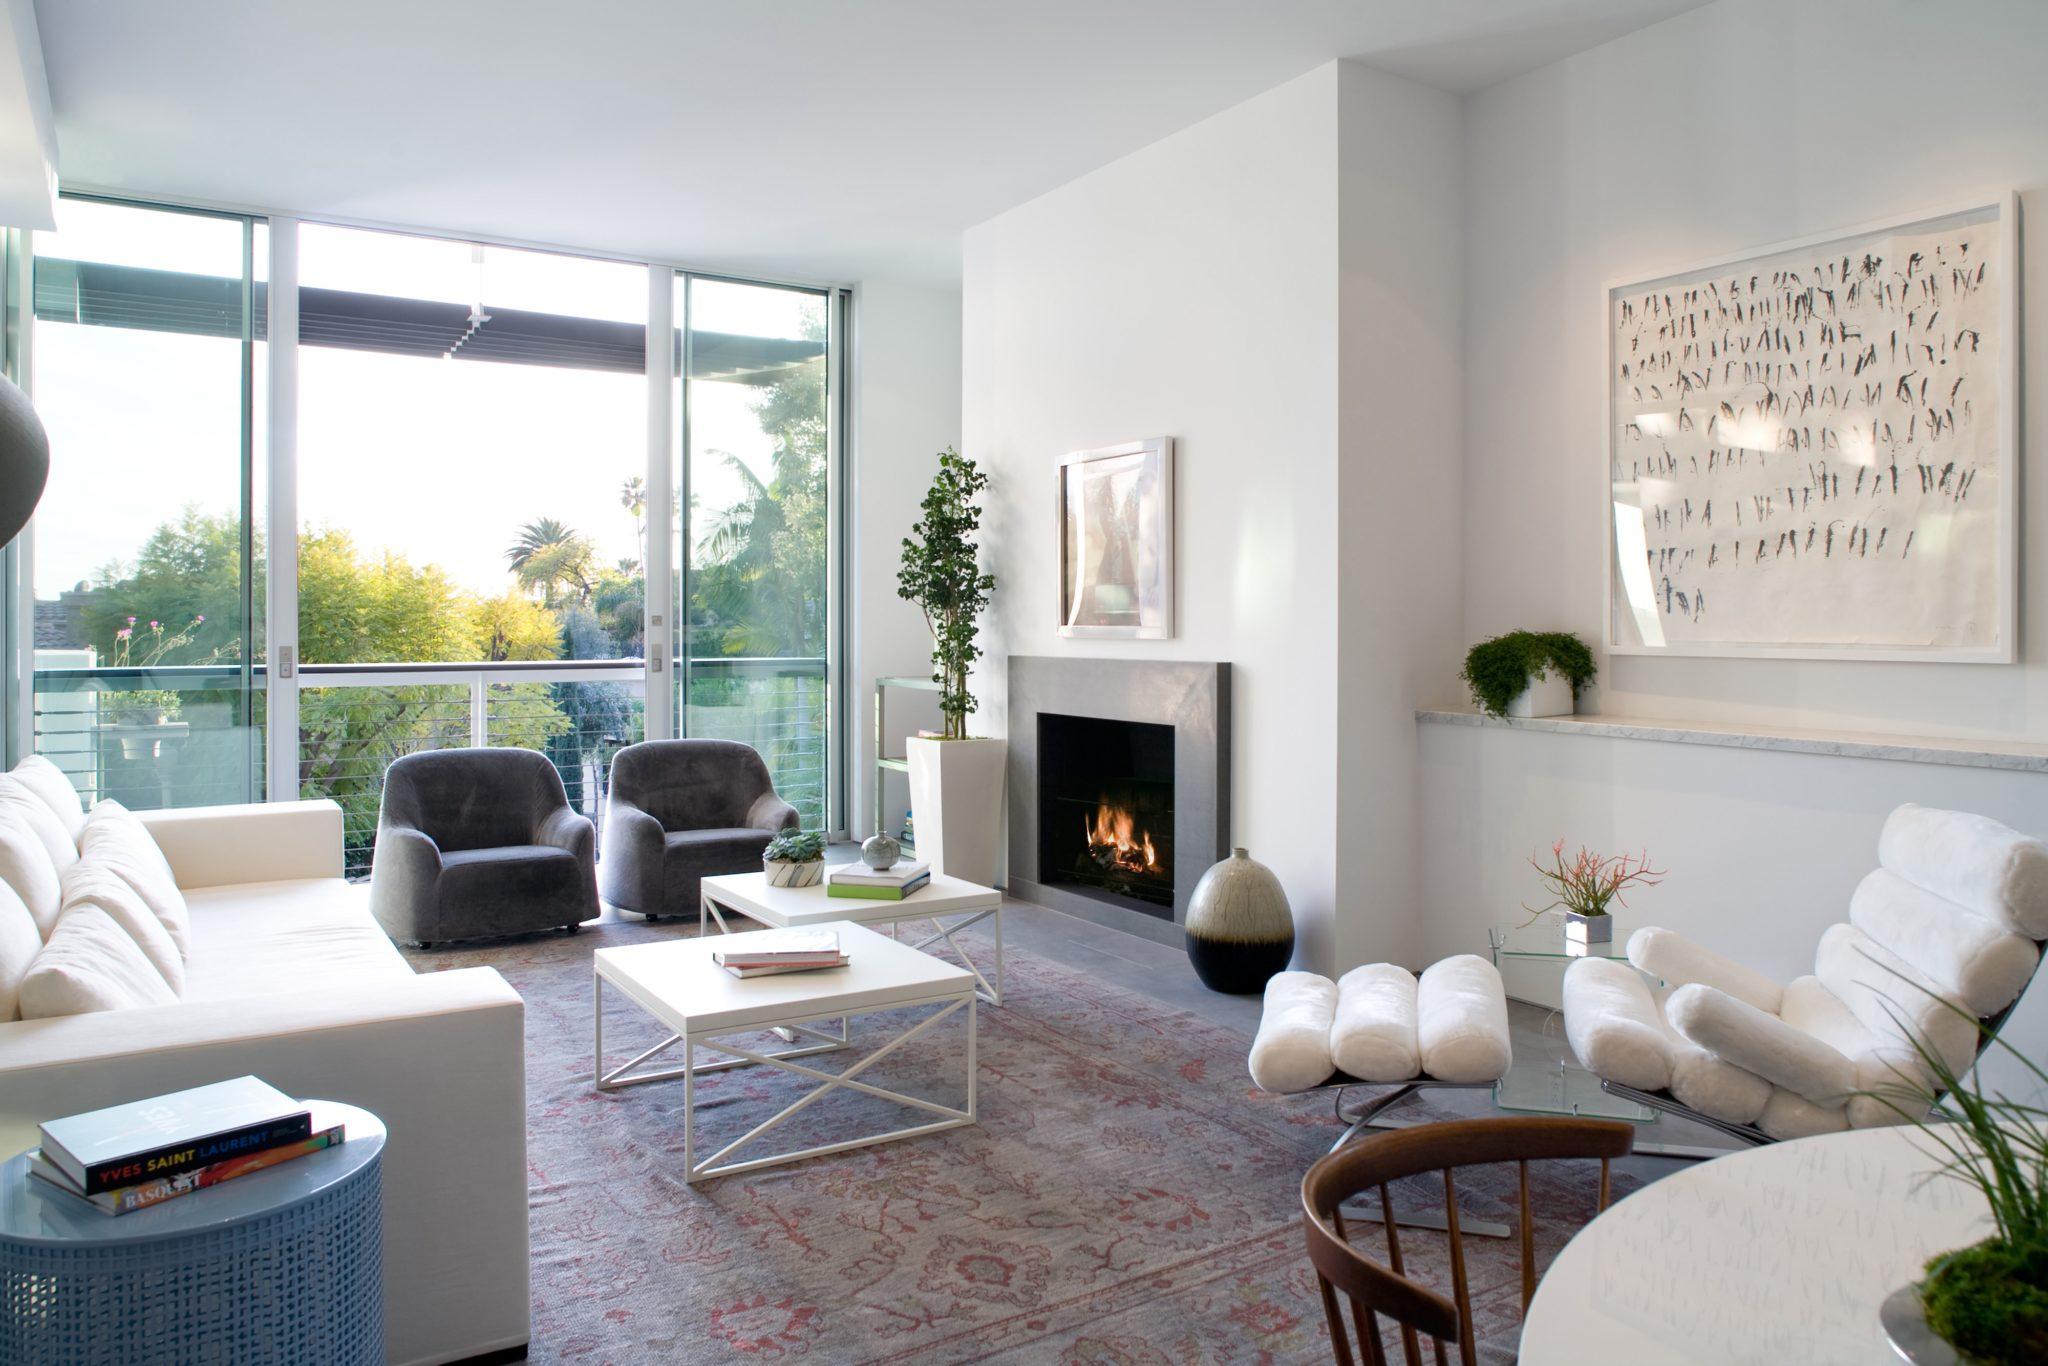 Interior design by Harrison Design